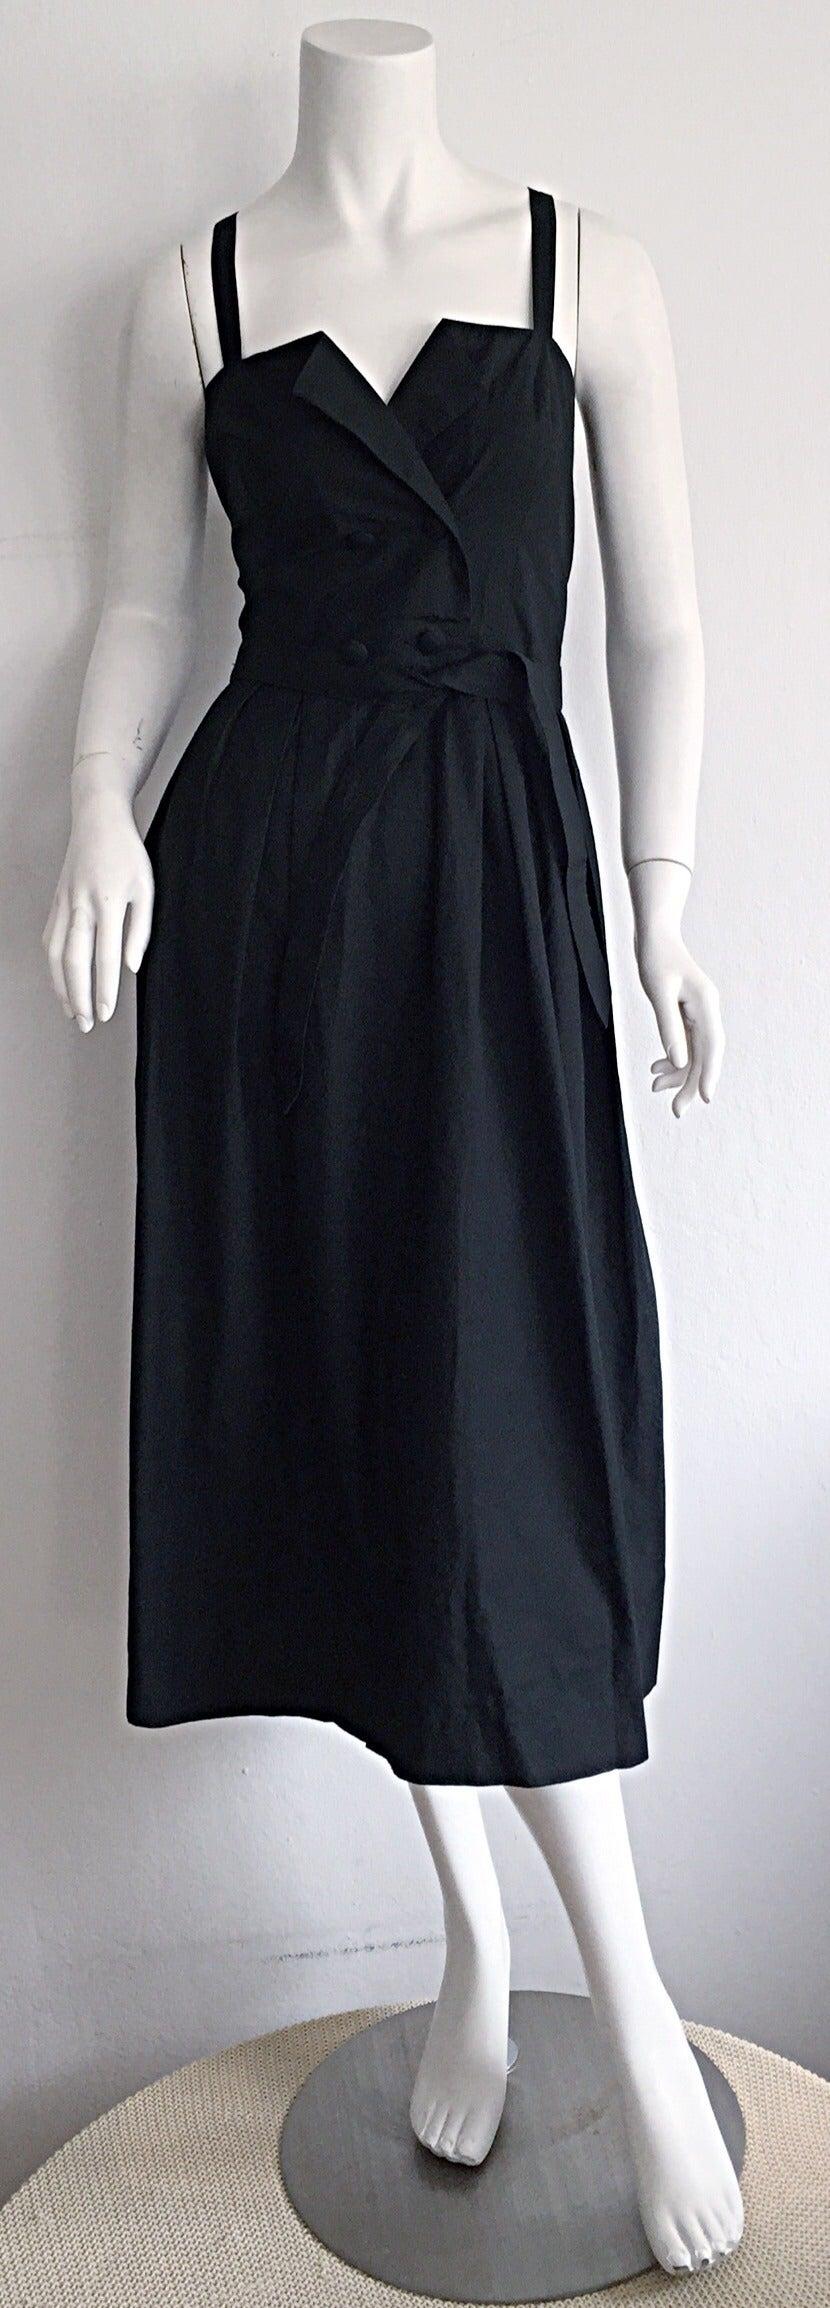 Beautiful Vintage Emmanuelle Khanh Black Cotton Tuxedo Sundress French Dress 3